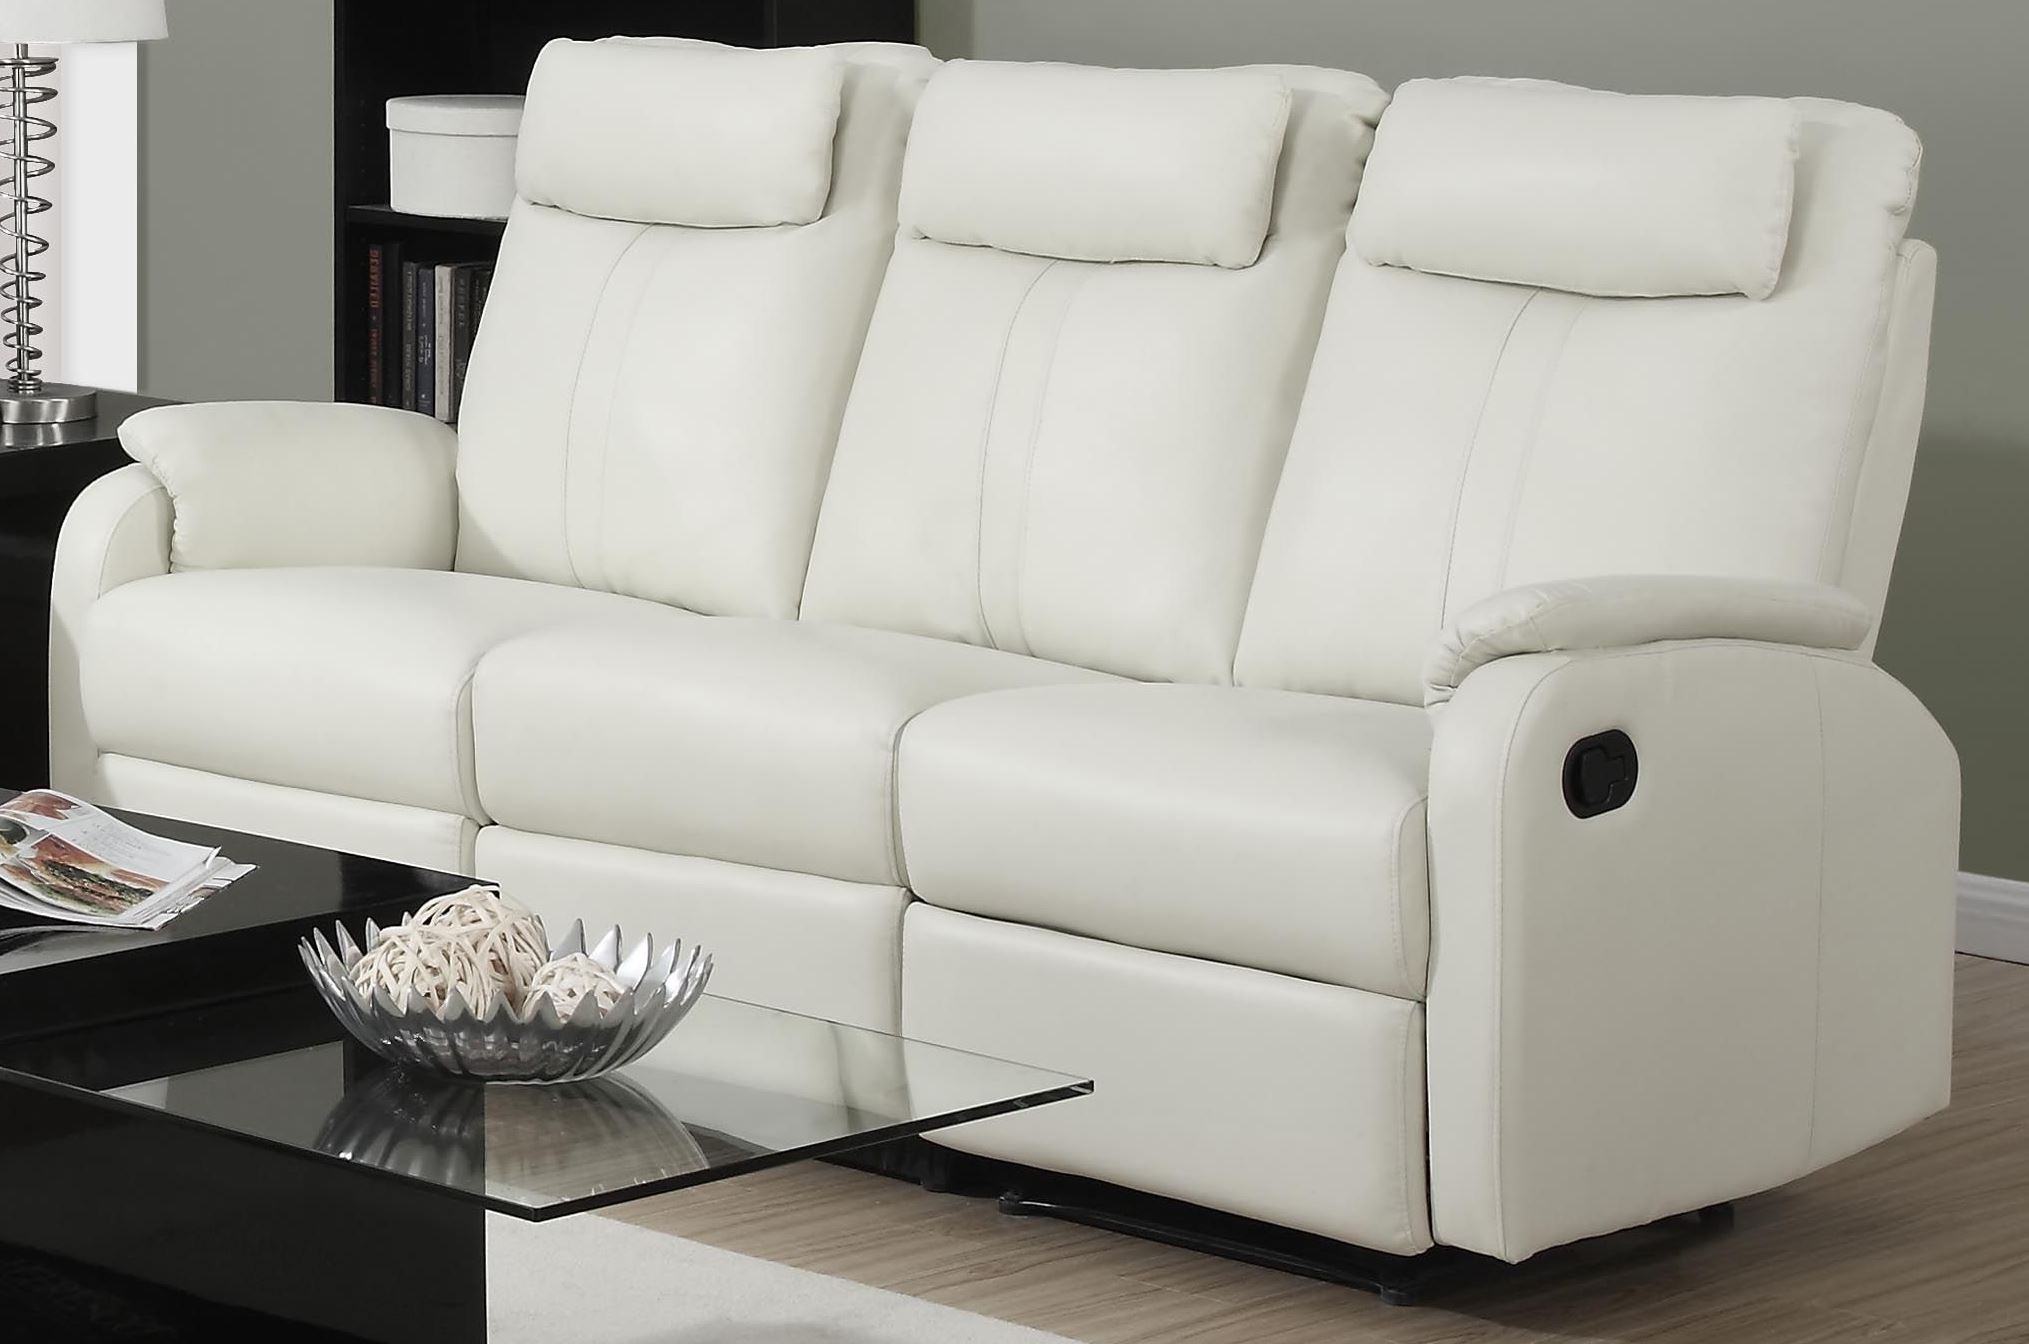 ivory sofa set vintage danish modern bed 81iv 3 bonded leather reclining living room